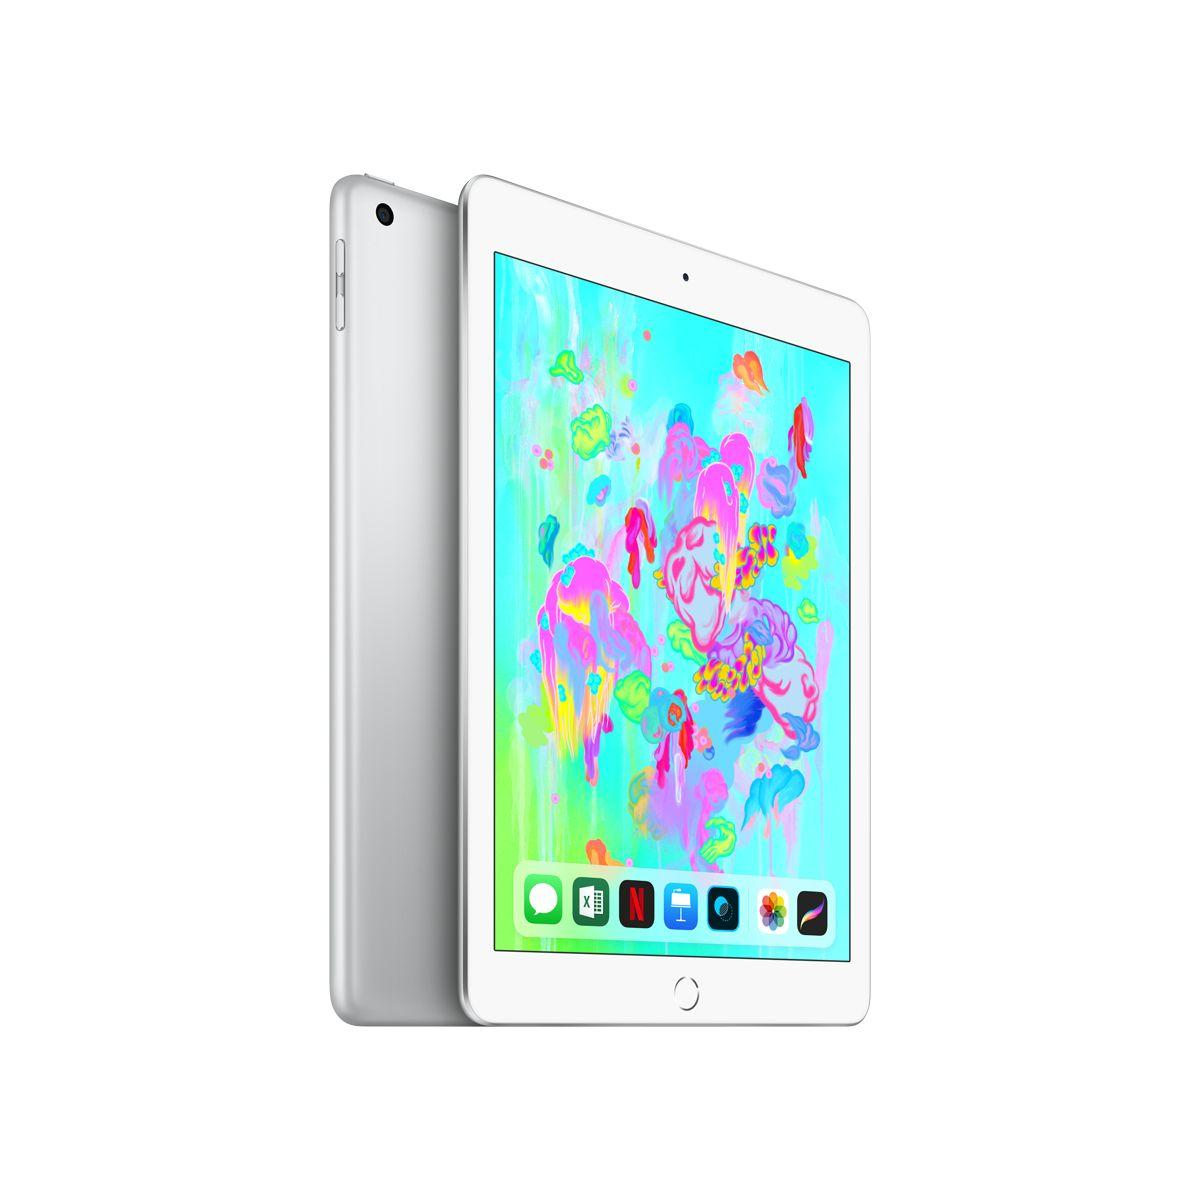 Tablette apple ipad new 128go argent (photo)